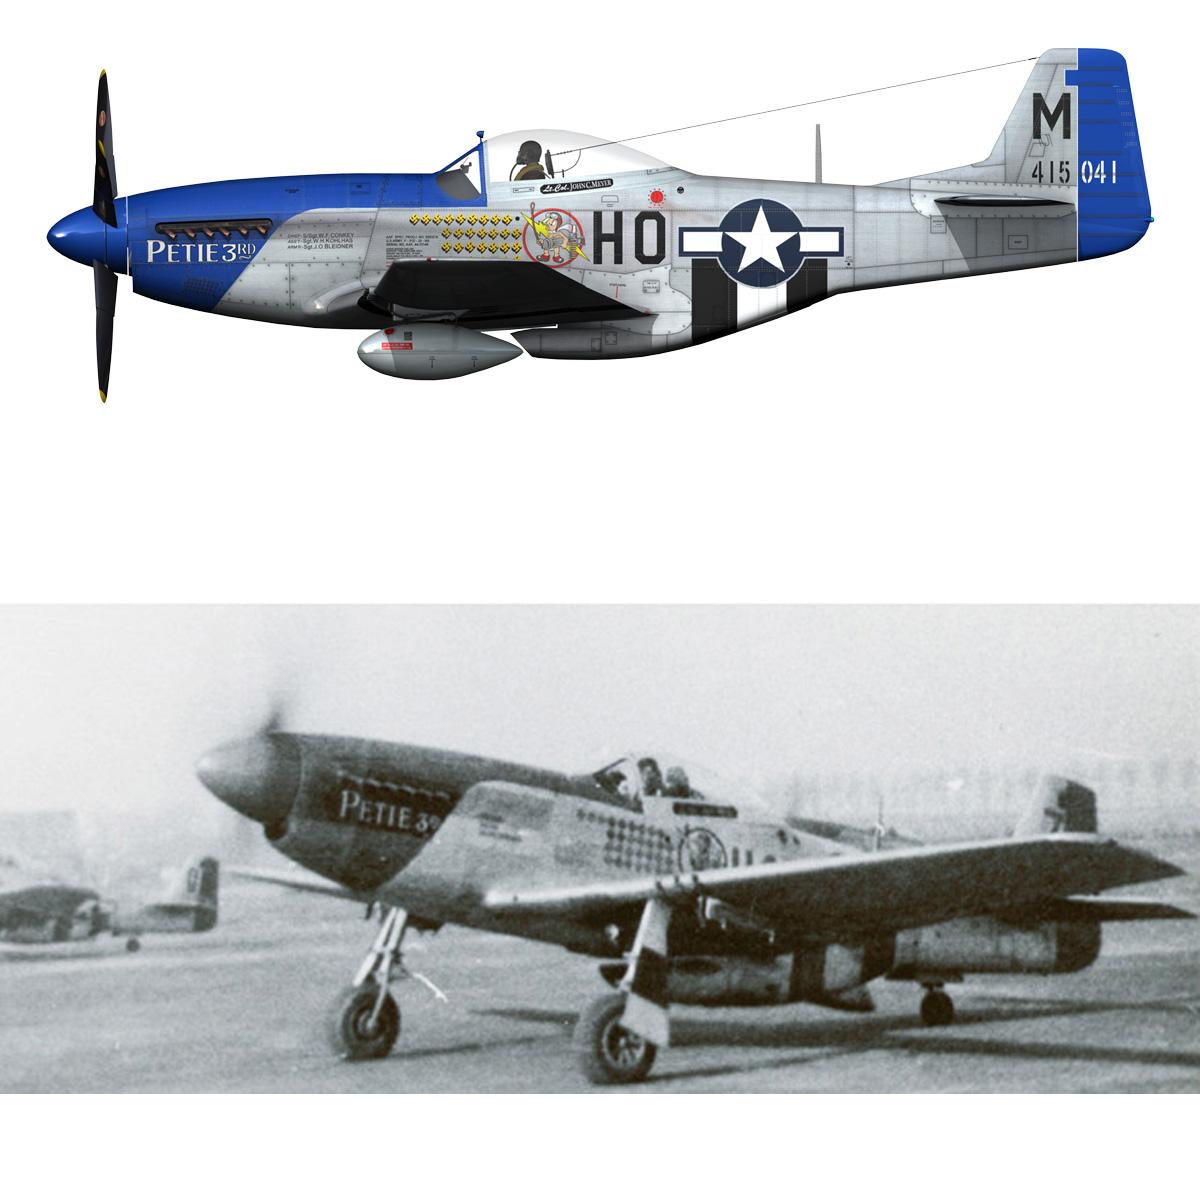 north american p-51d mustang – petie 3rd 3d model fbx c4d lwo obj 280144